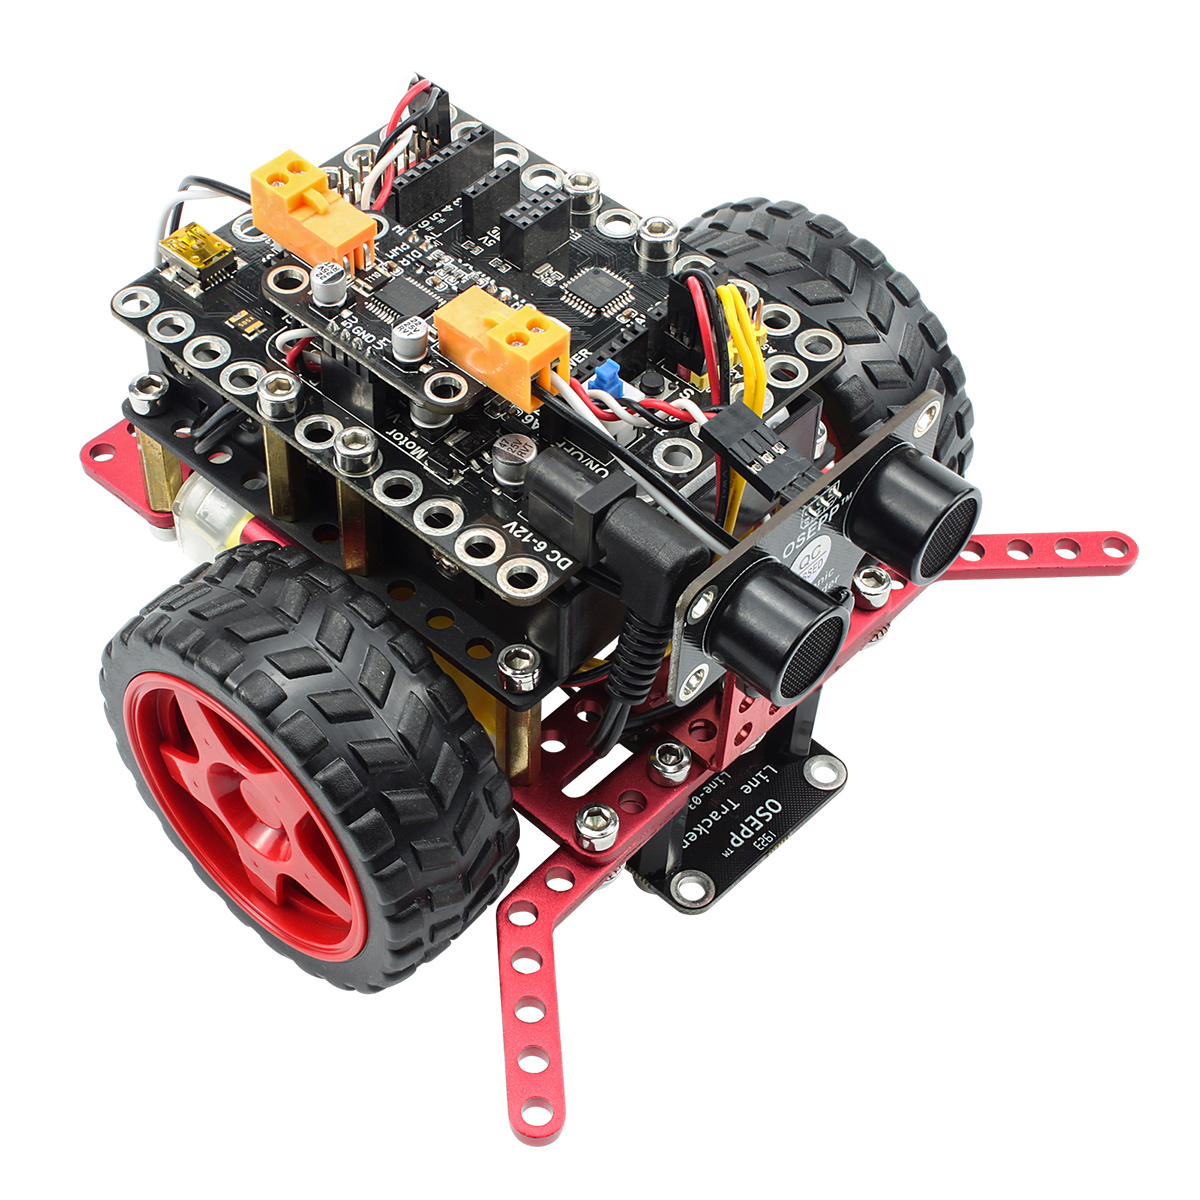 RoboPro Robotic Basics Kit For Arduino Line Tracker Obstacle Avoidance Sumo drag drop Programming Educational Stem